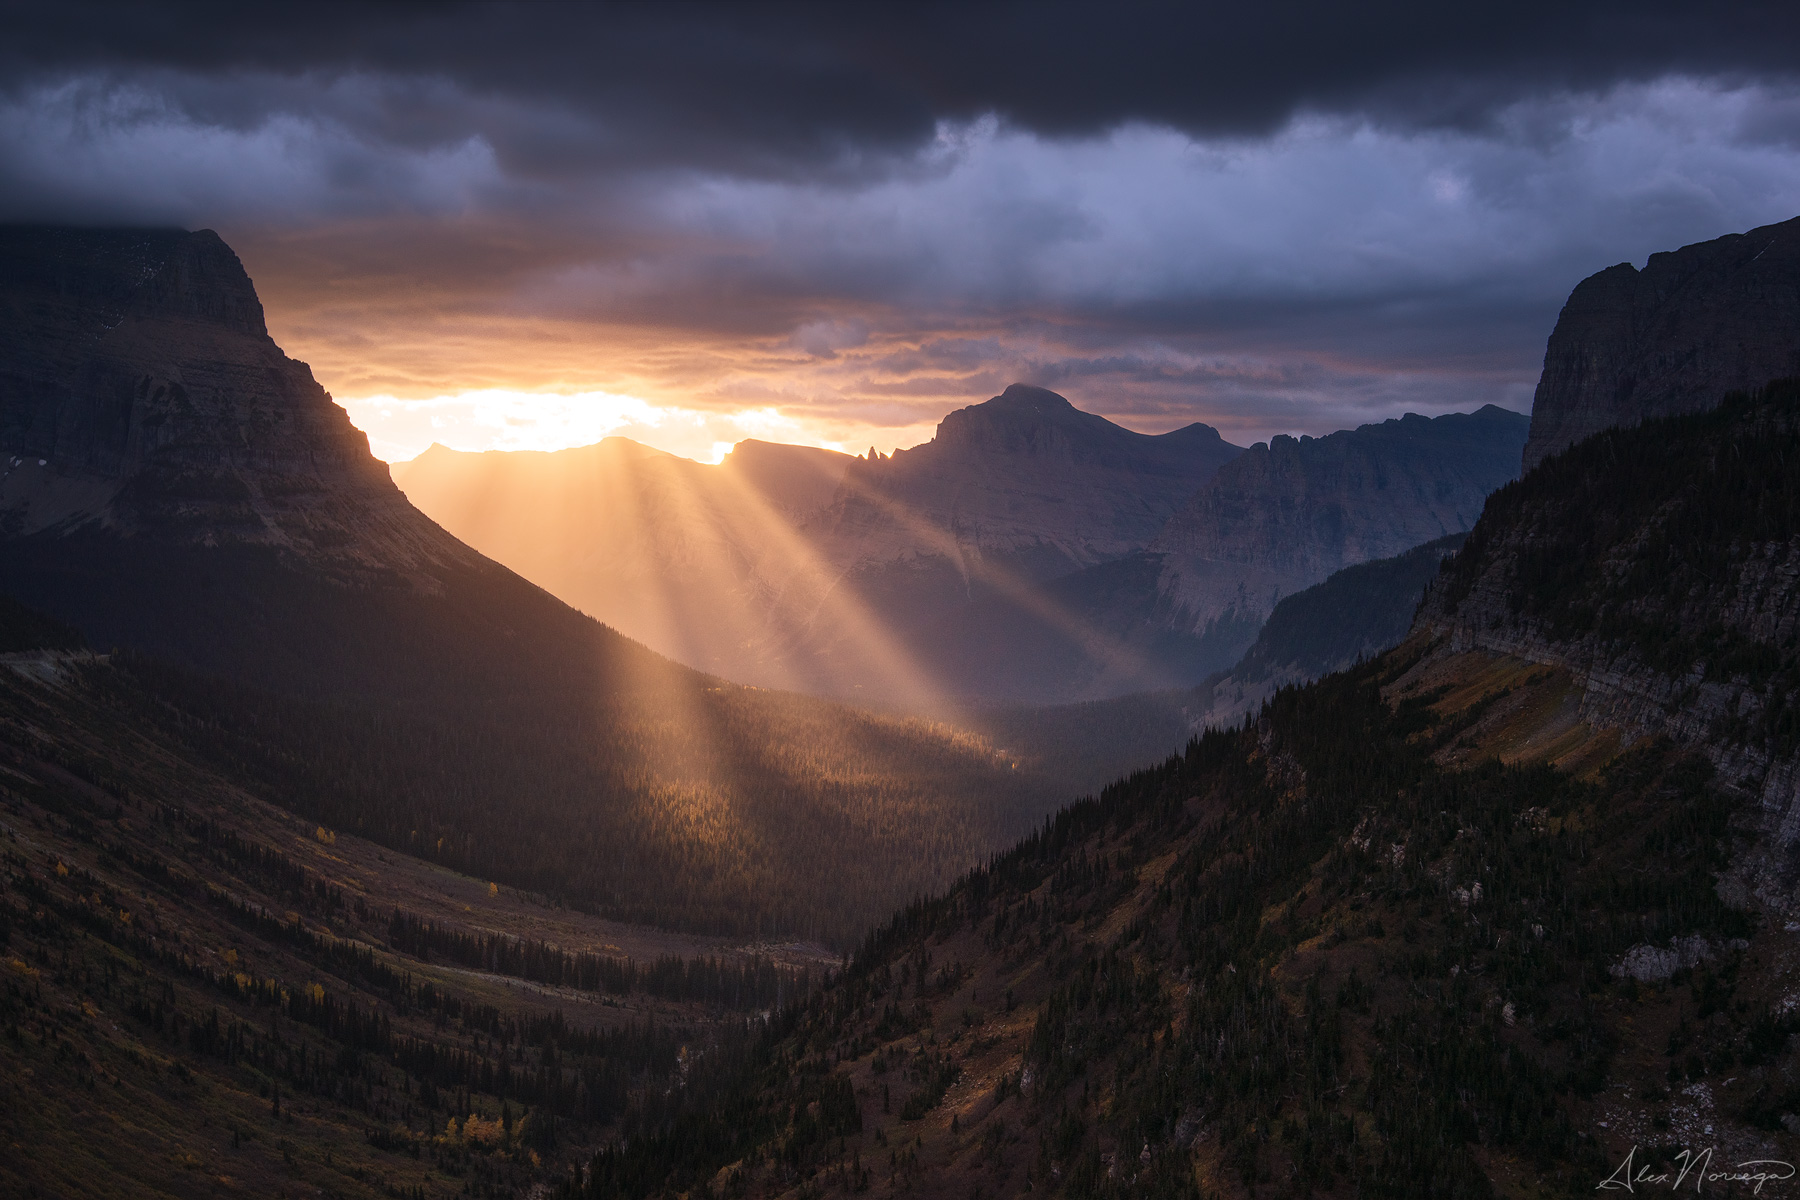 Prelude of Light